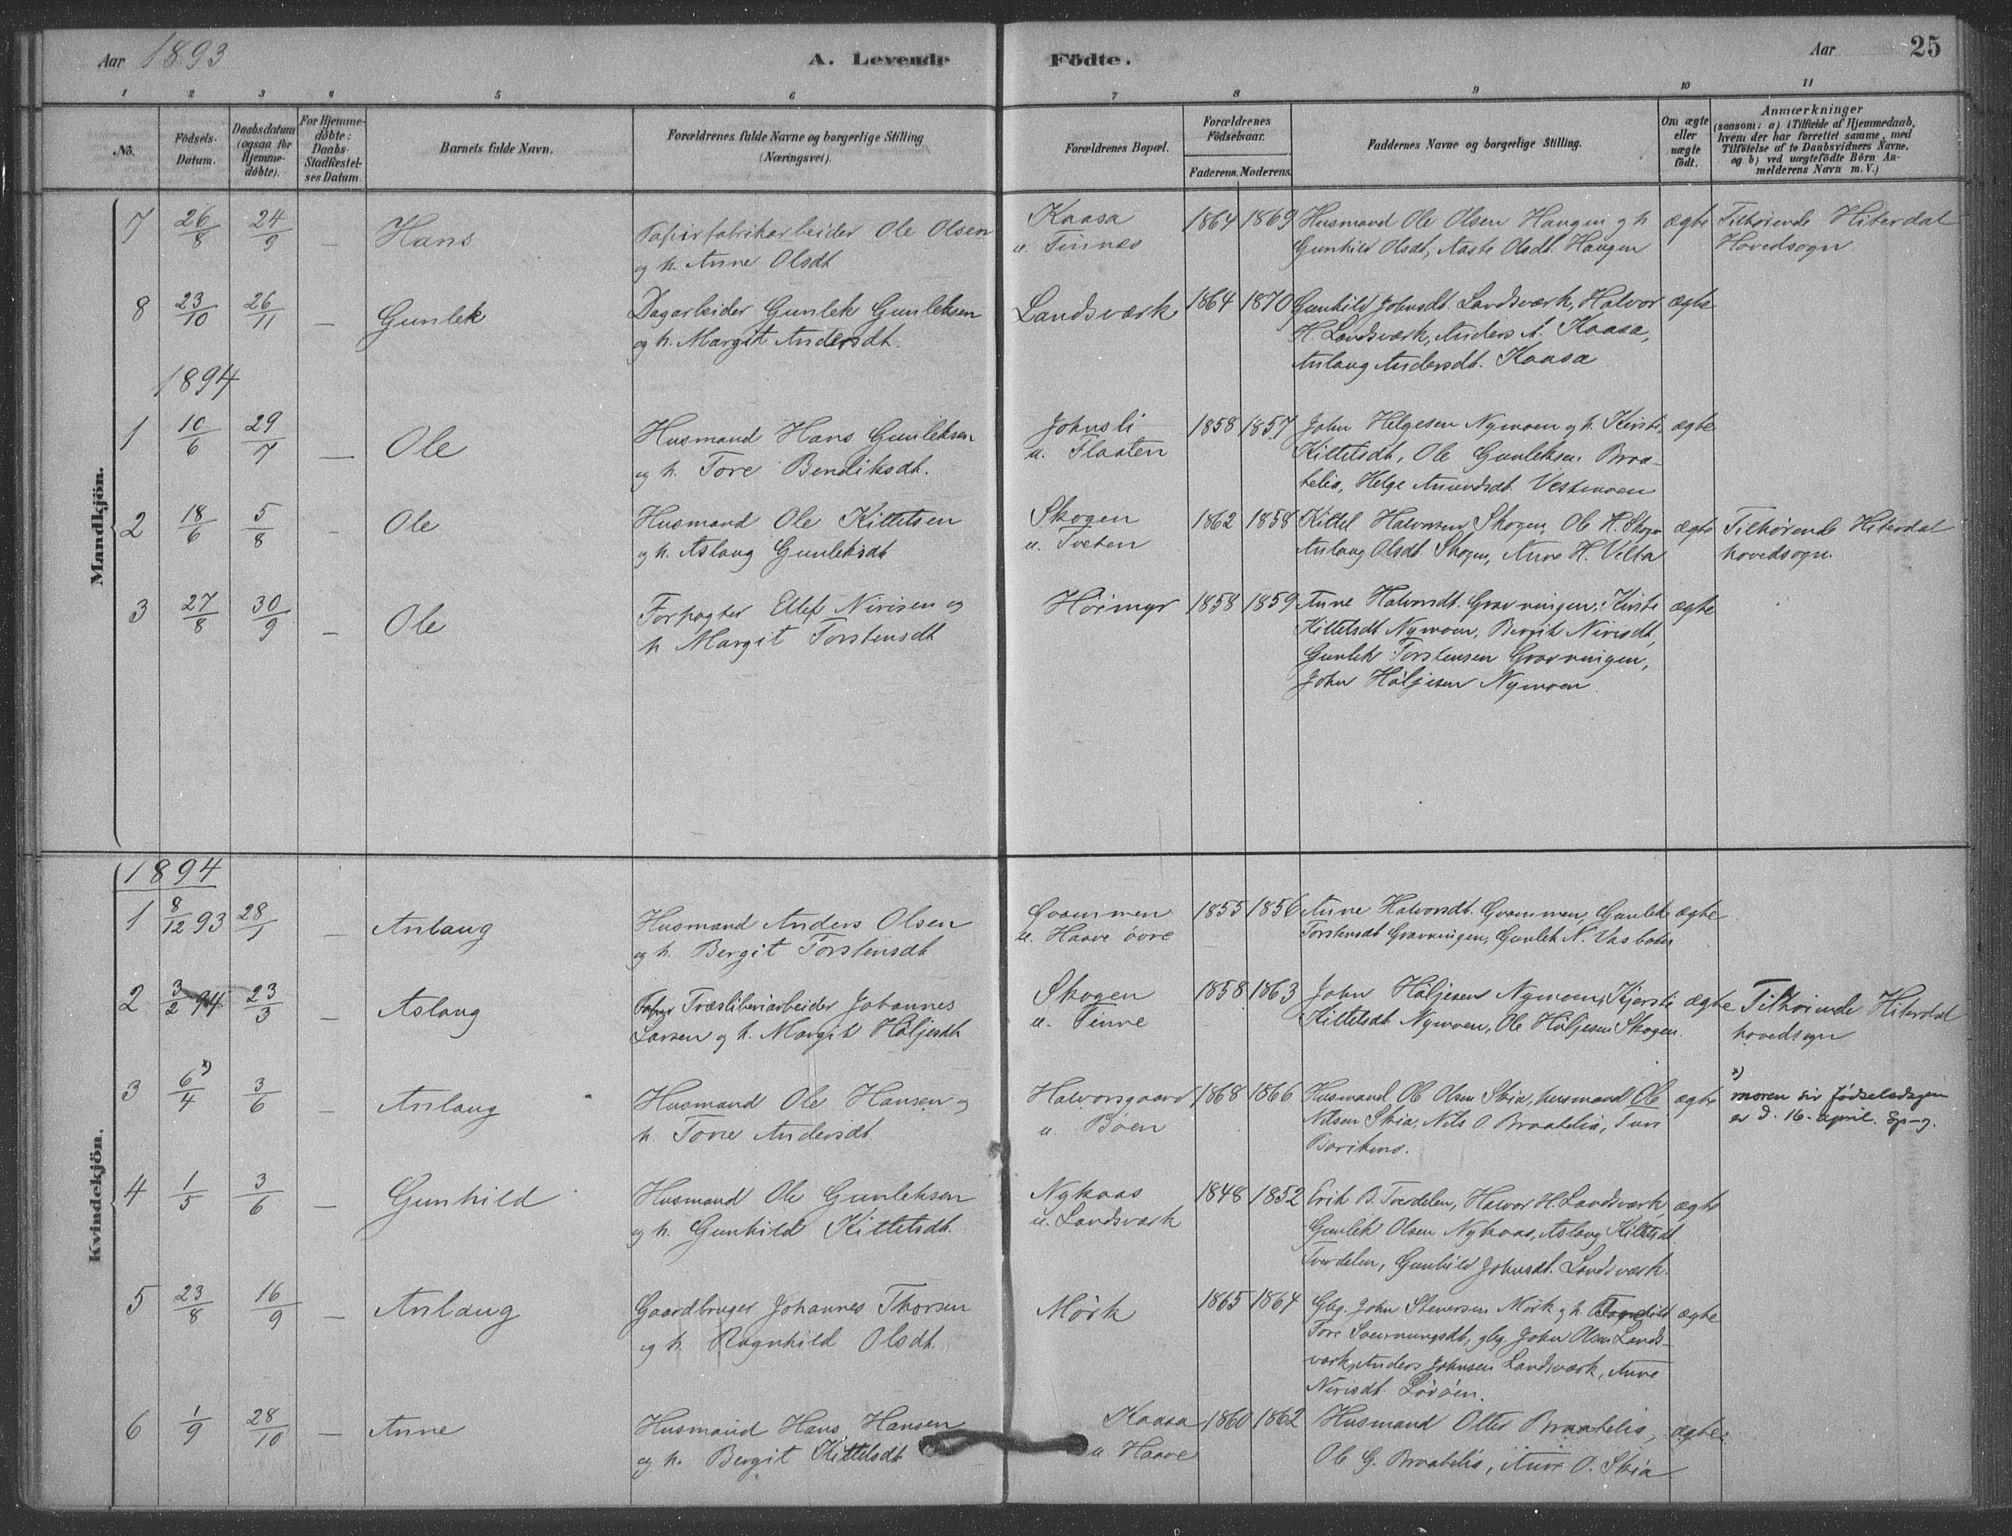 SAKO, Heddal kirkebøker, F/Fb/L0002: Ministerialbok nr. II 2, 1878-1913, s. 25